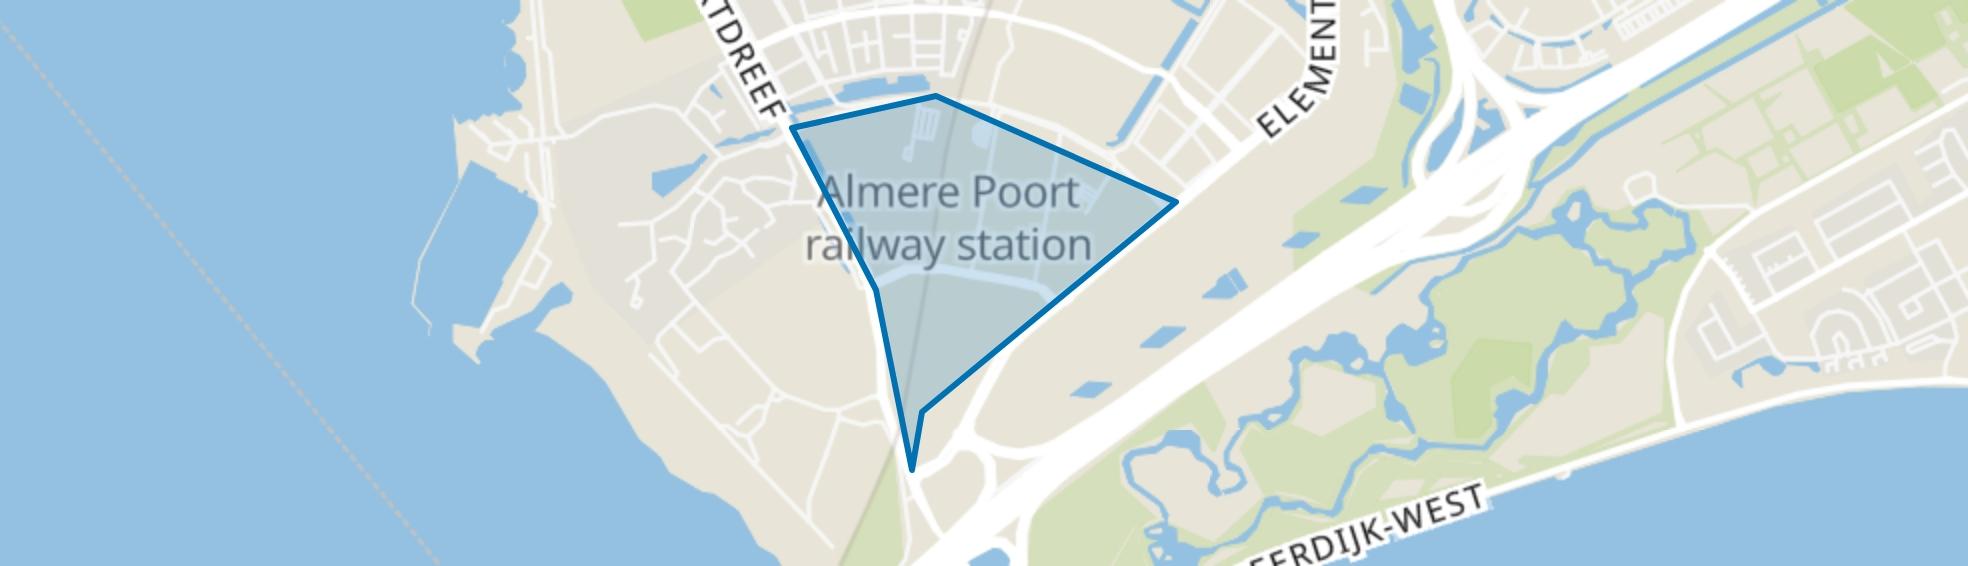 Olympiakwartier, Almere map